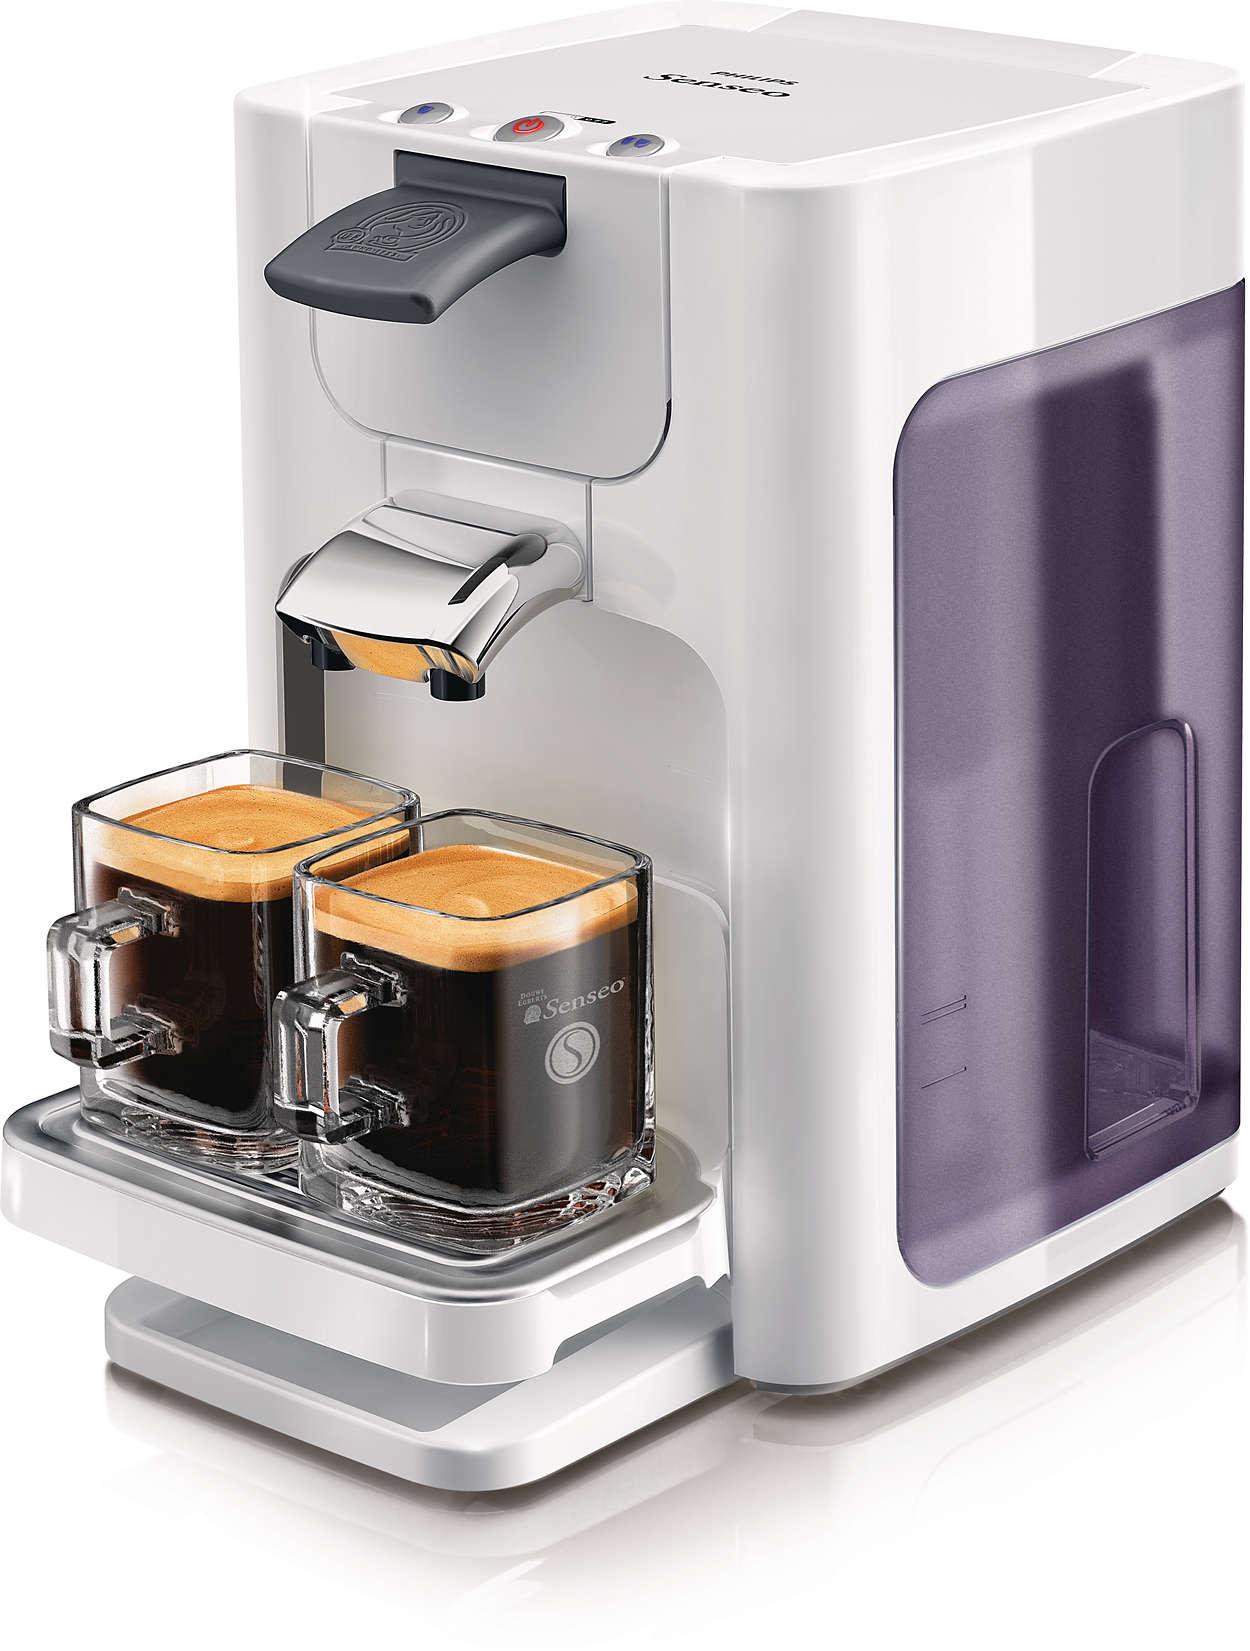 quadrante kaffeepadmaschine hd7860 10 senseo. Black Bedroom Furniture Sets. Home Design Ideas